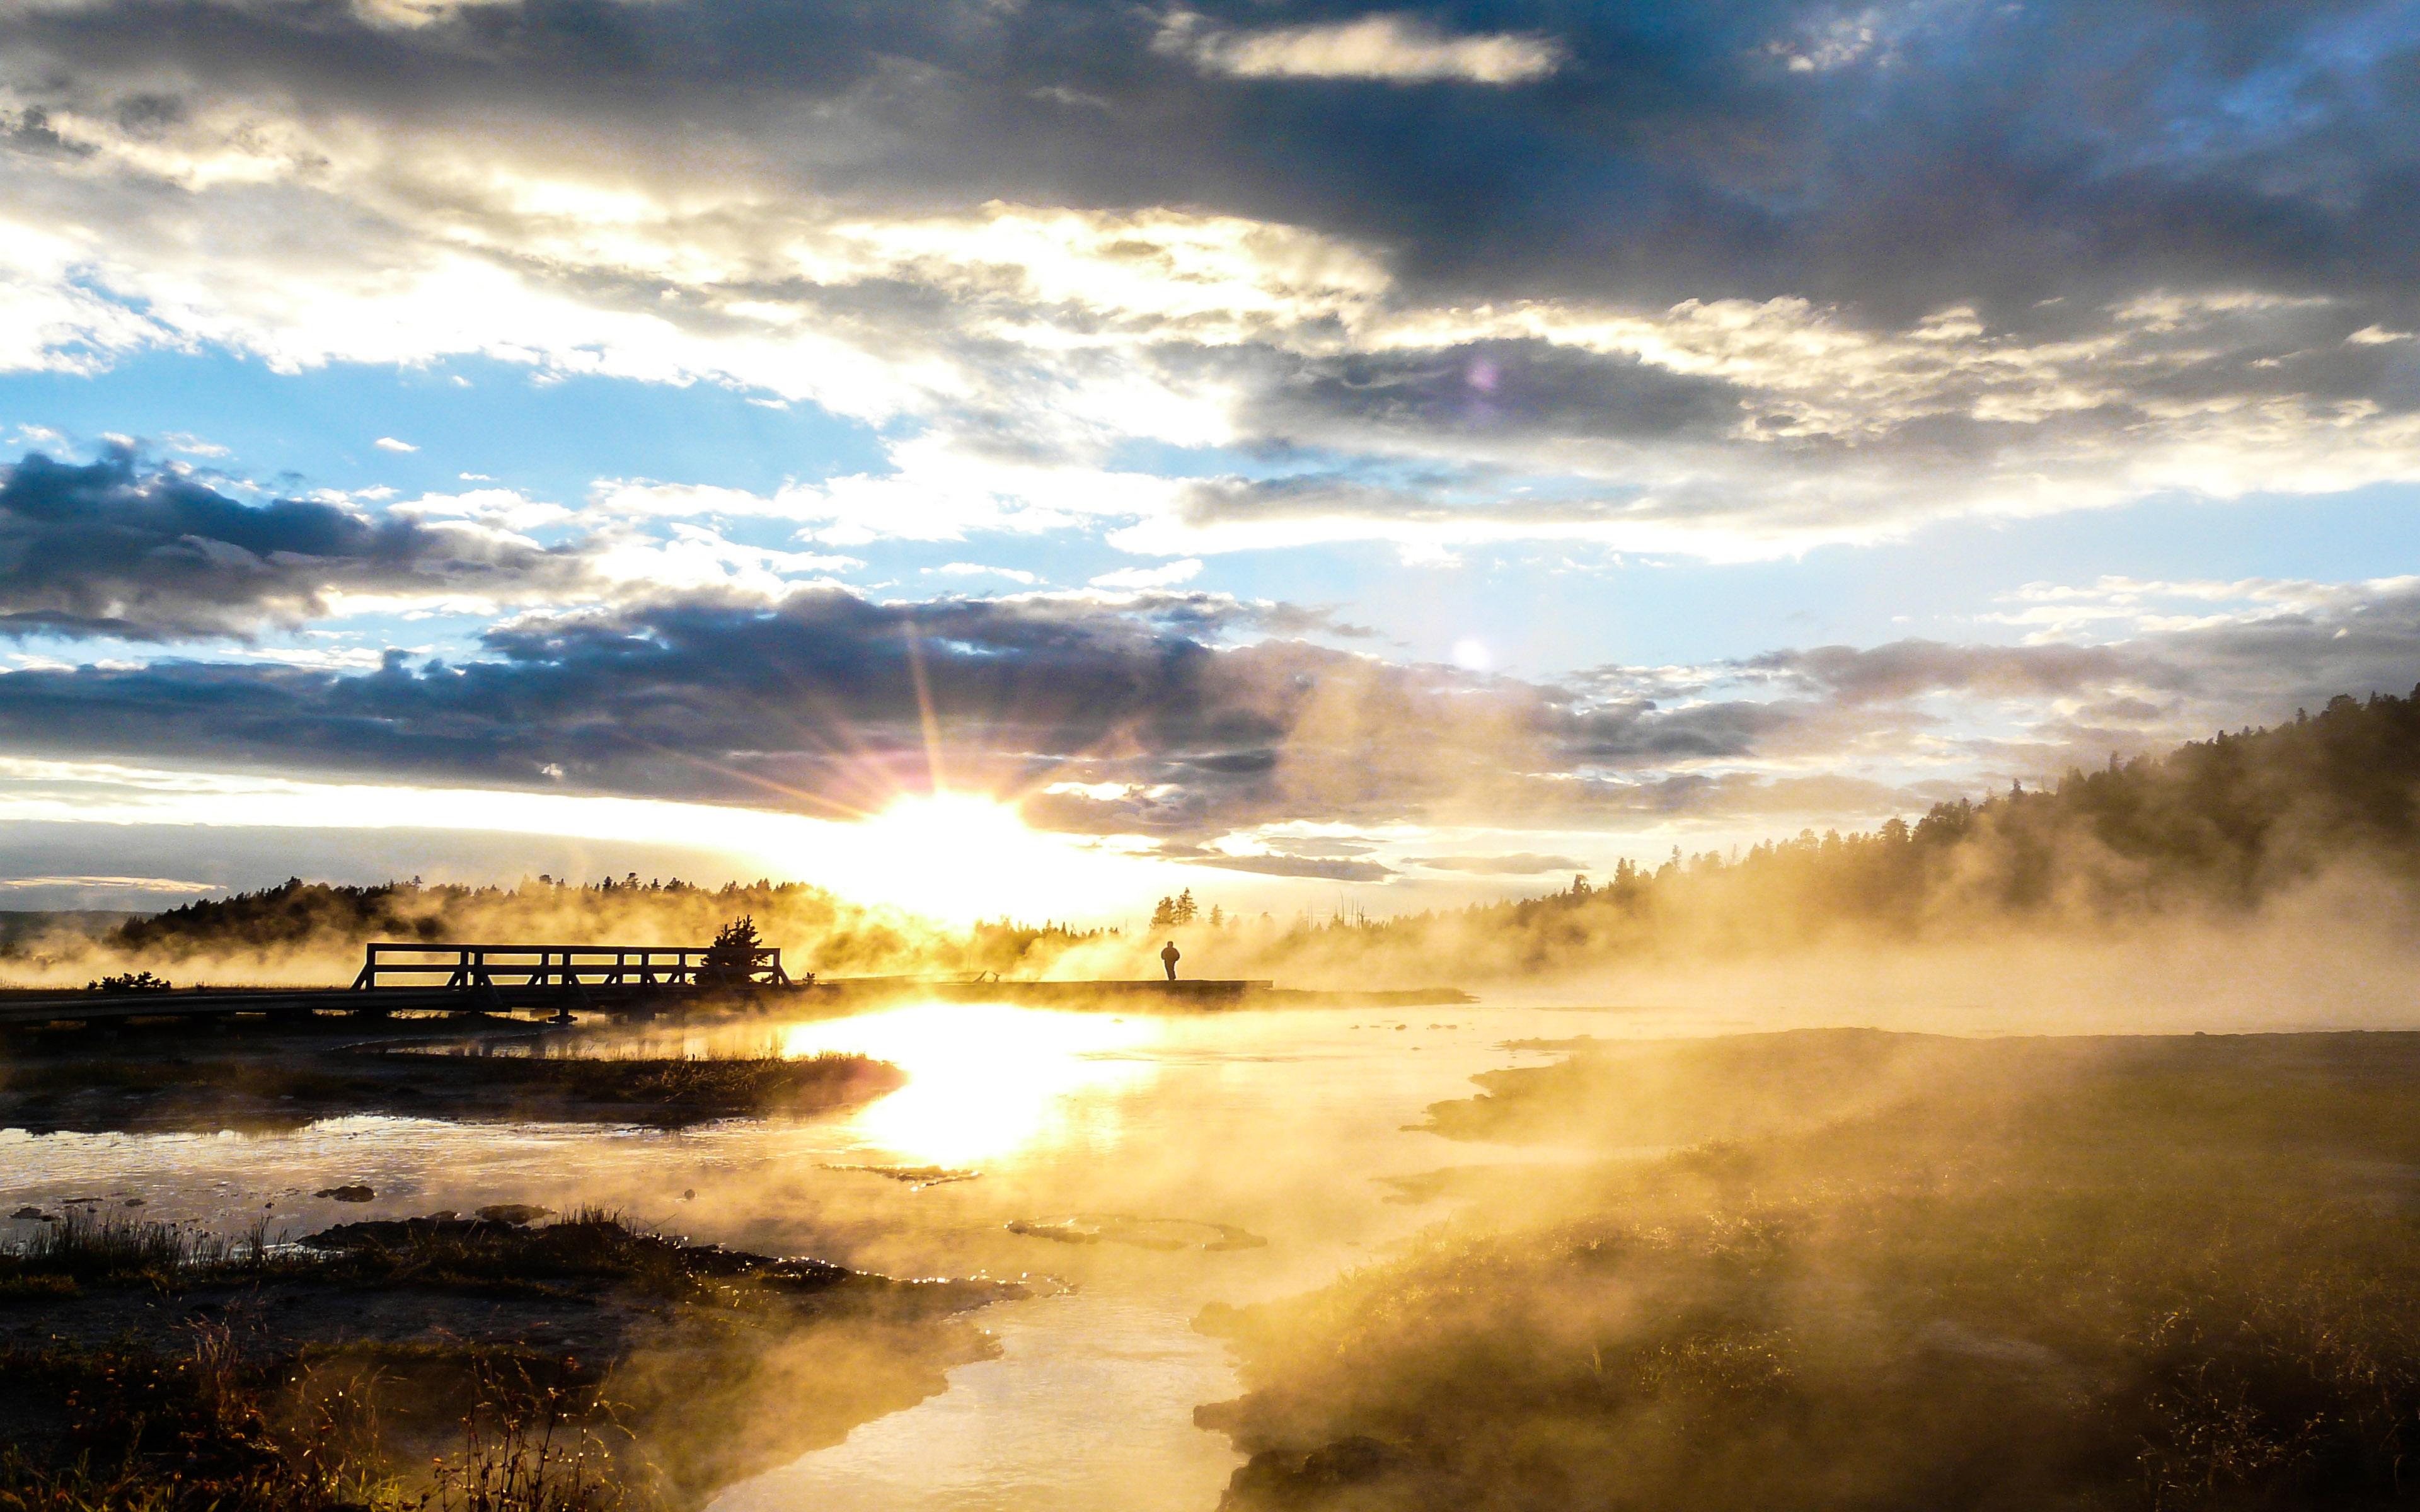 Yellowstone National Park Sunset Wallpaper 3840x2400